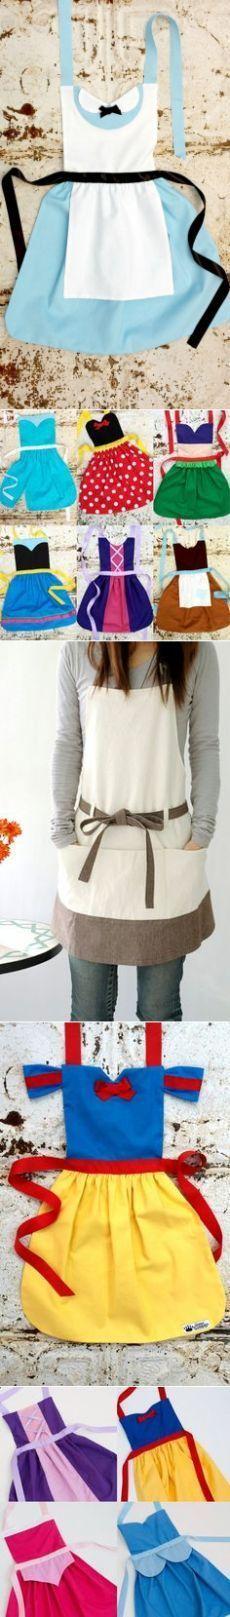 Alice in Wonderland Disney Princess inspired Child Costume Apron PDF sewing Patter. Girls sizes 2-8 Dress up